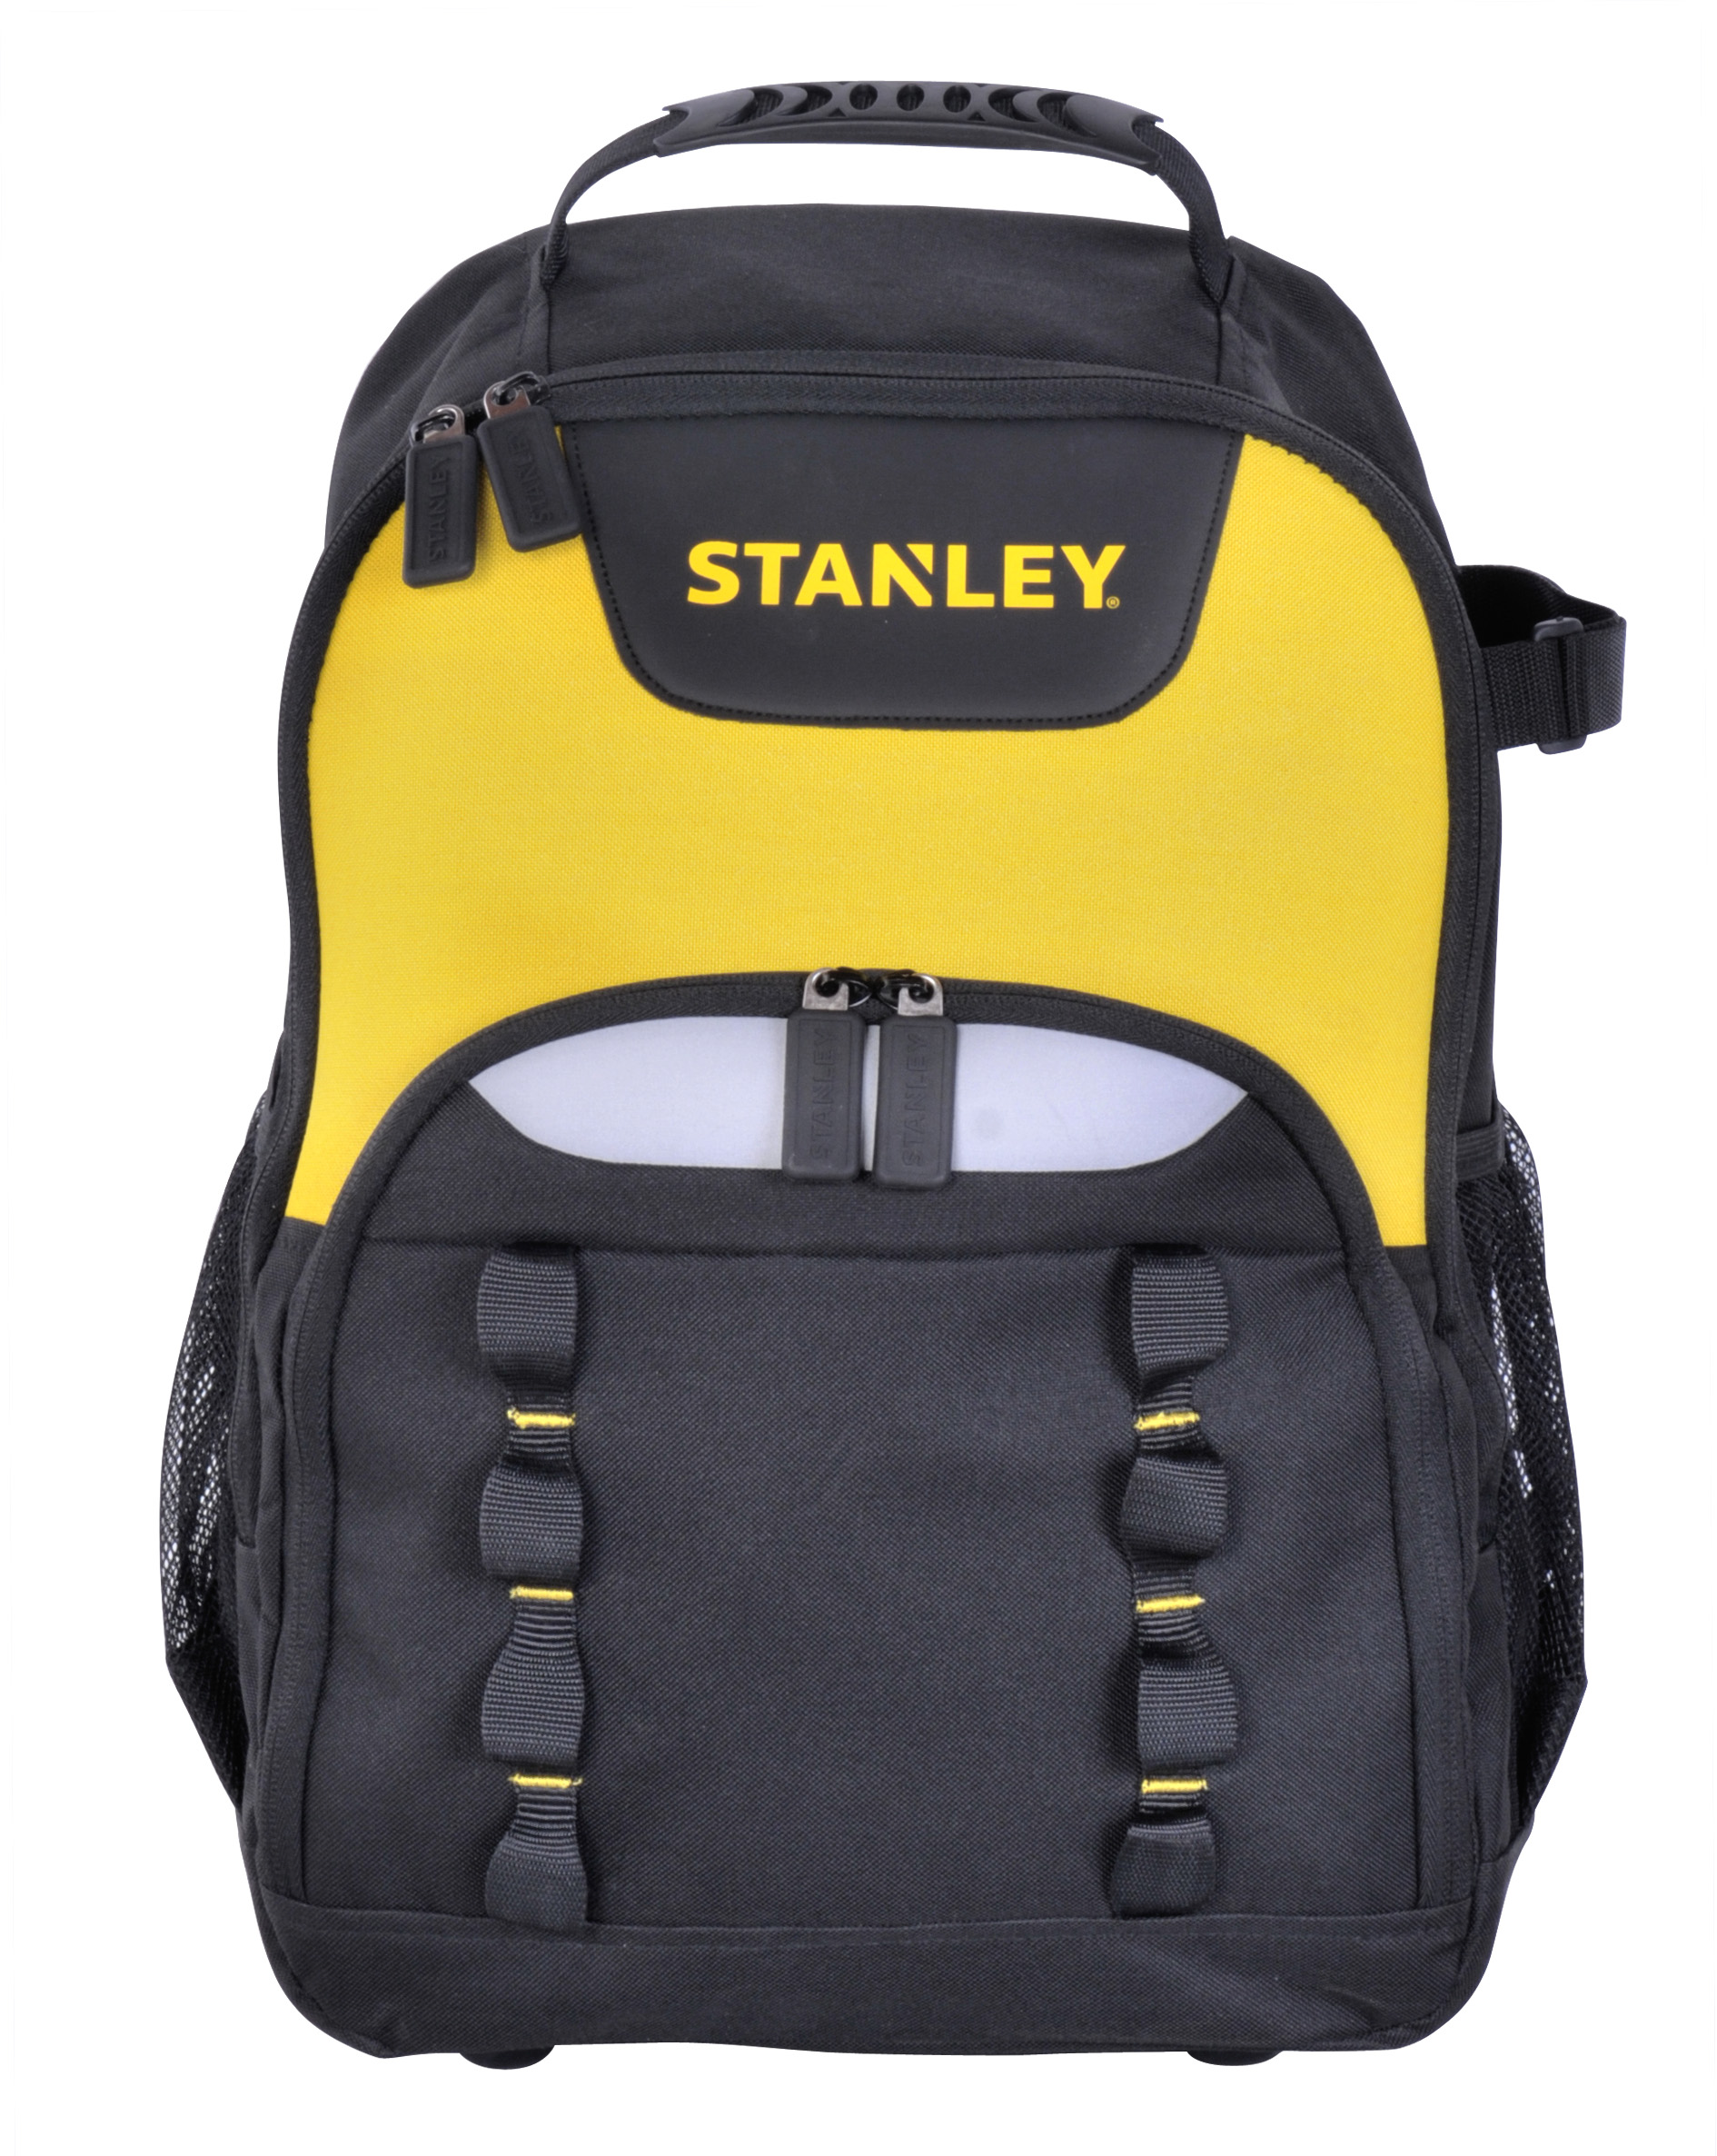 Mochila porta ferramenta STST1 72335 Stanley